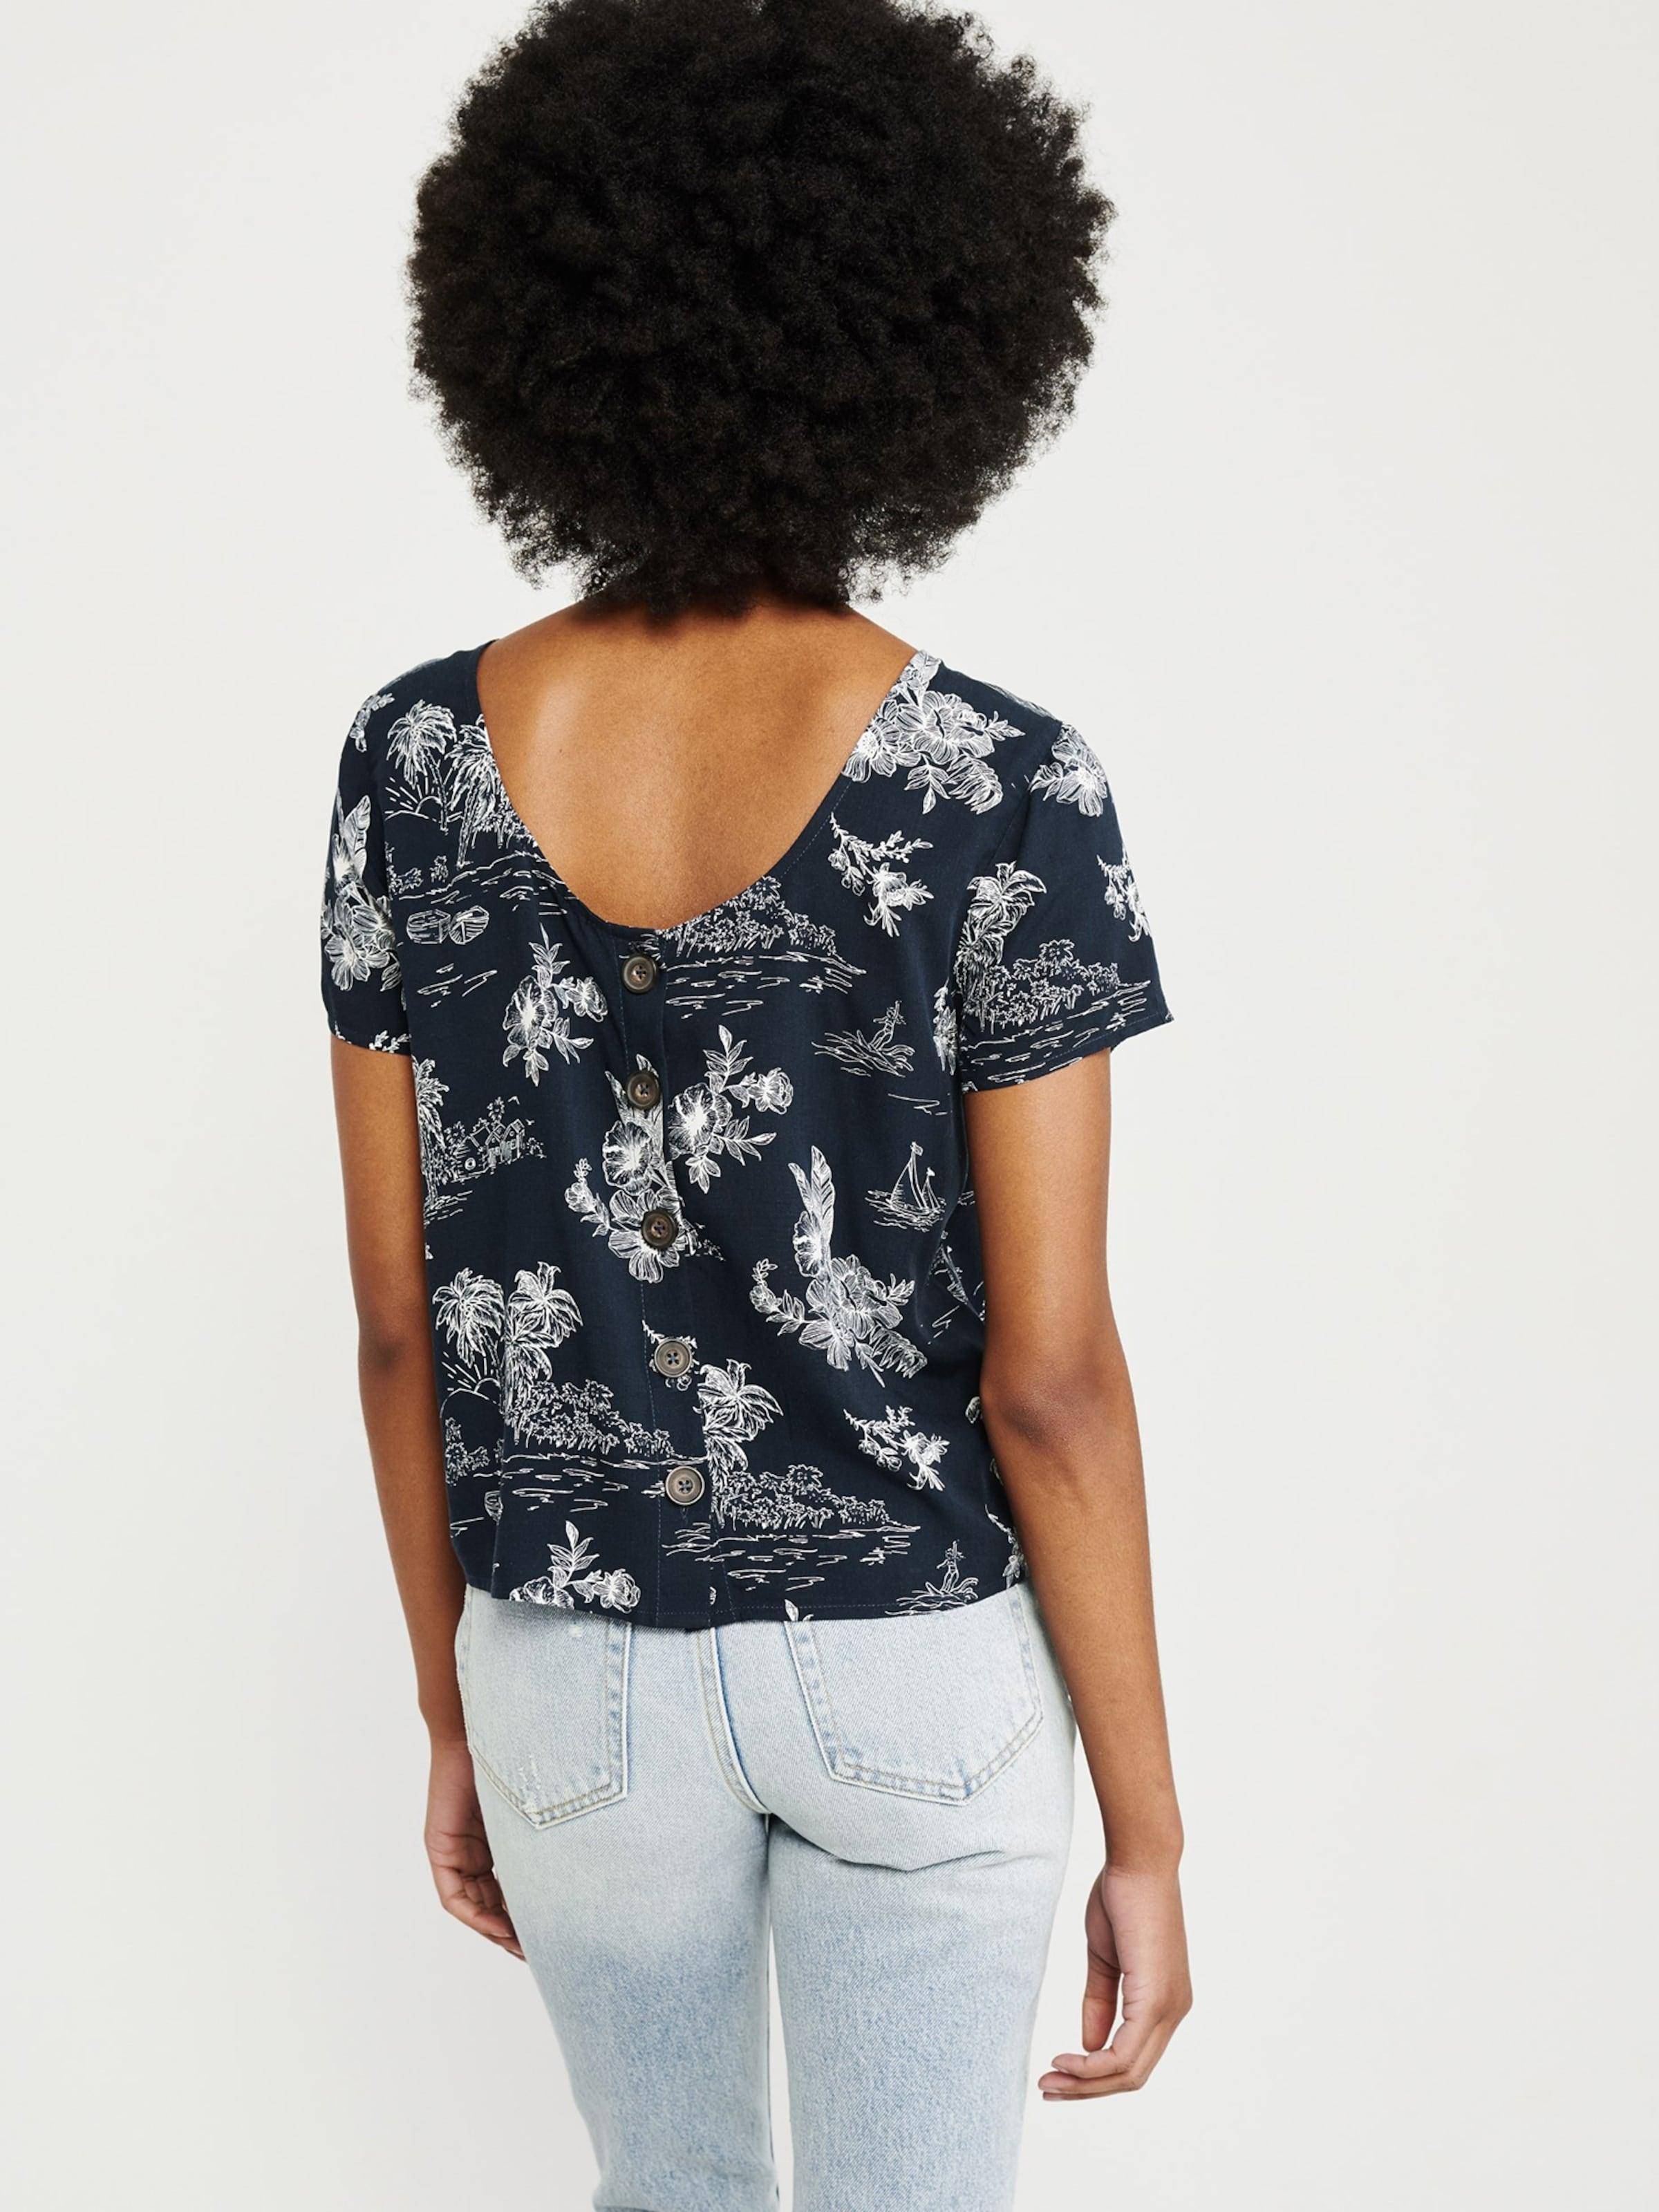 En Jaune Fitch T shirt Abercrombieamp; 0wXNOZPk8n